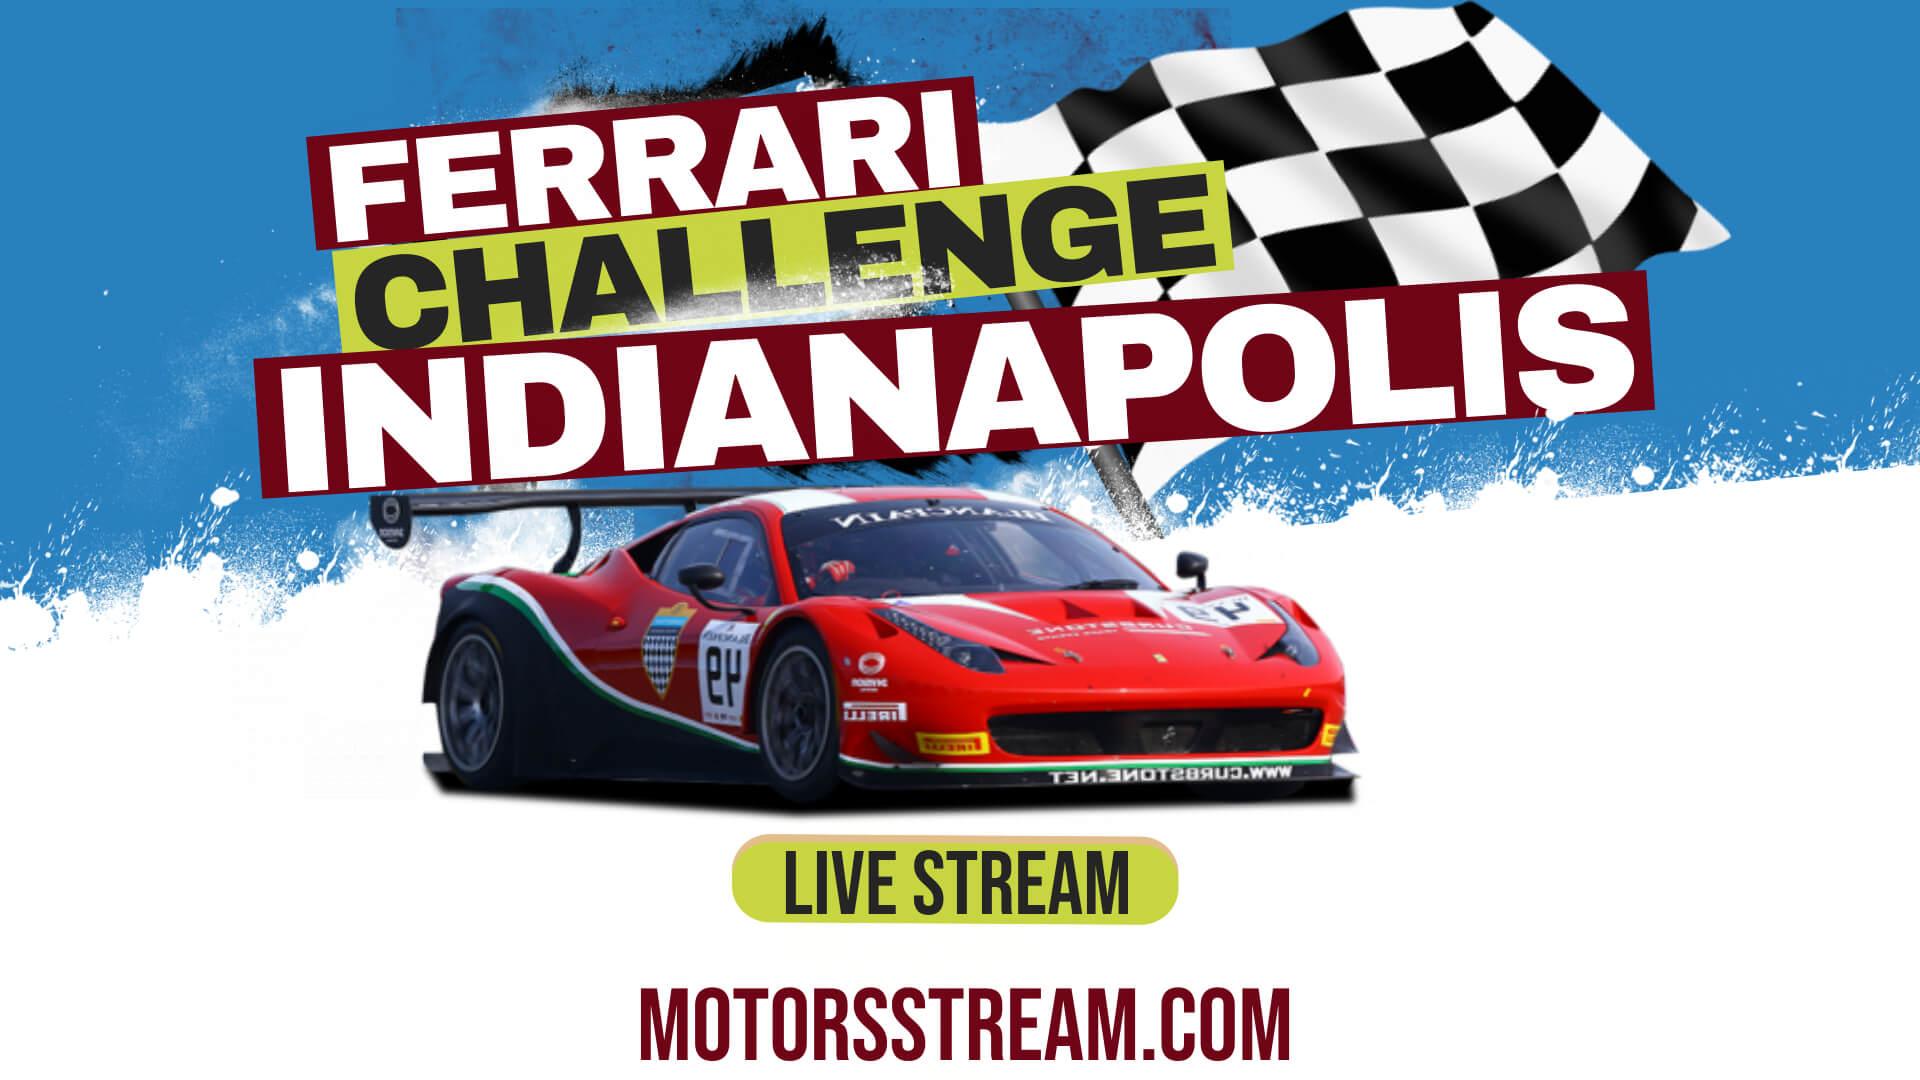 Indianapolis Ferrari Challenge Live Stream